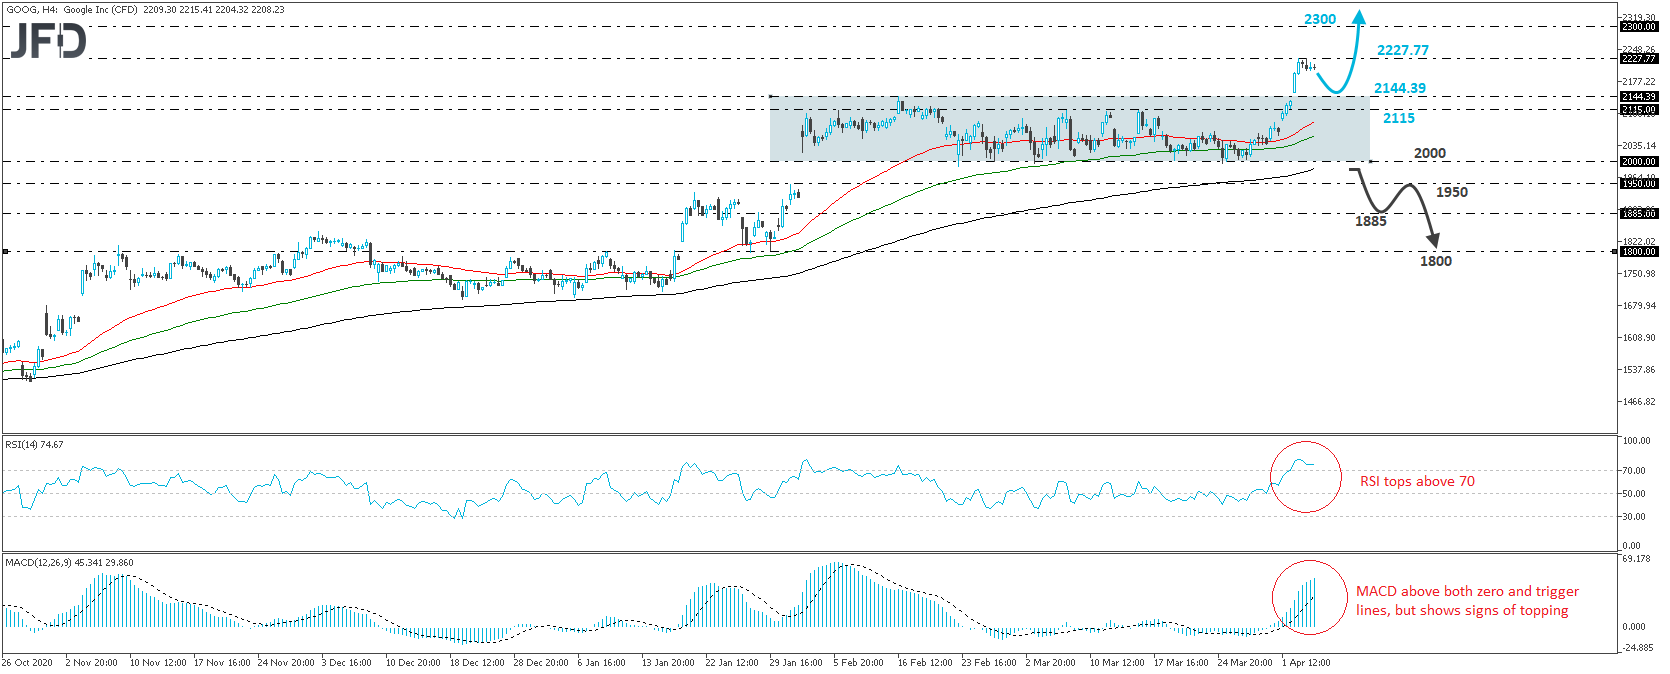 Allphabet stock 4-hour chart technical analysis